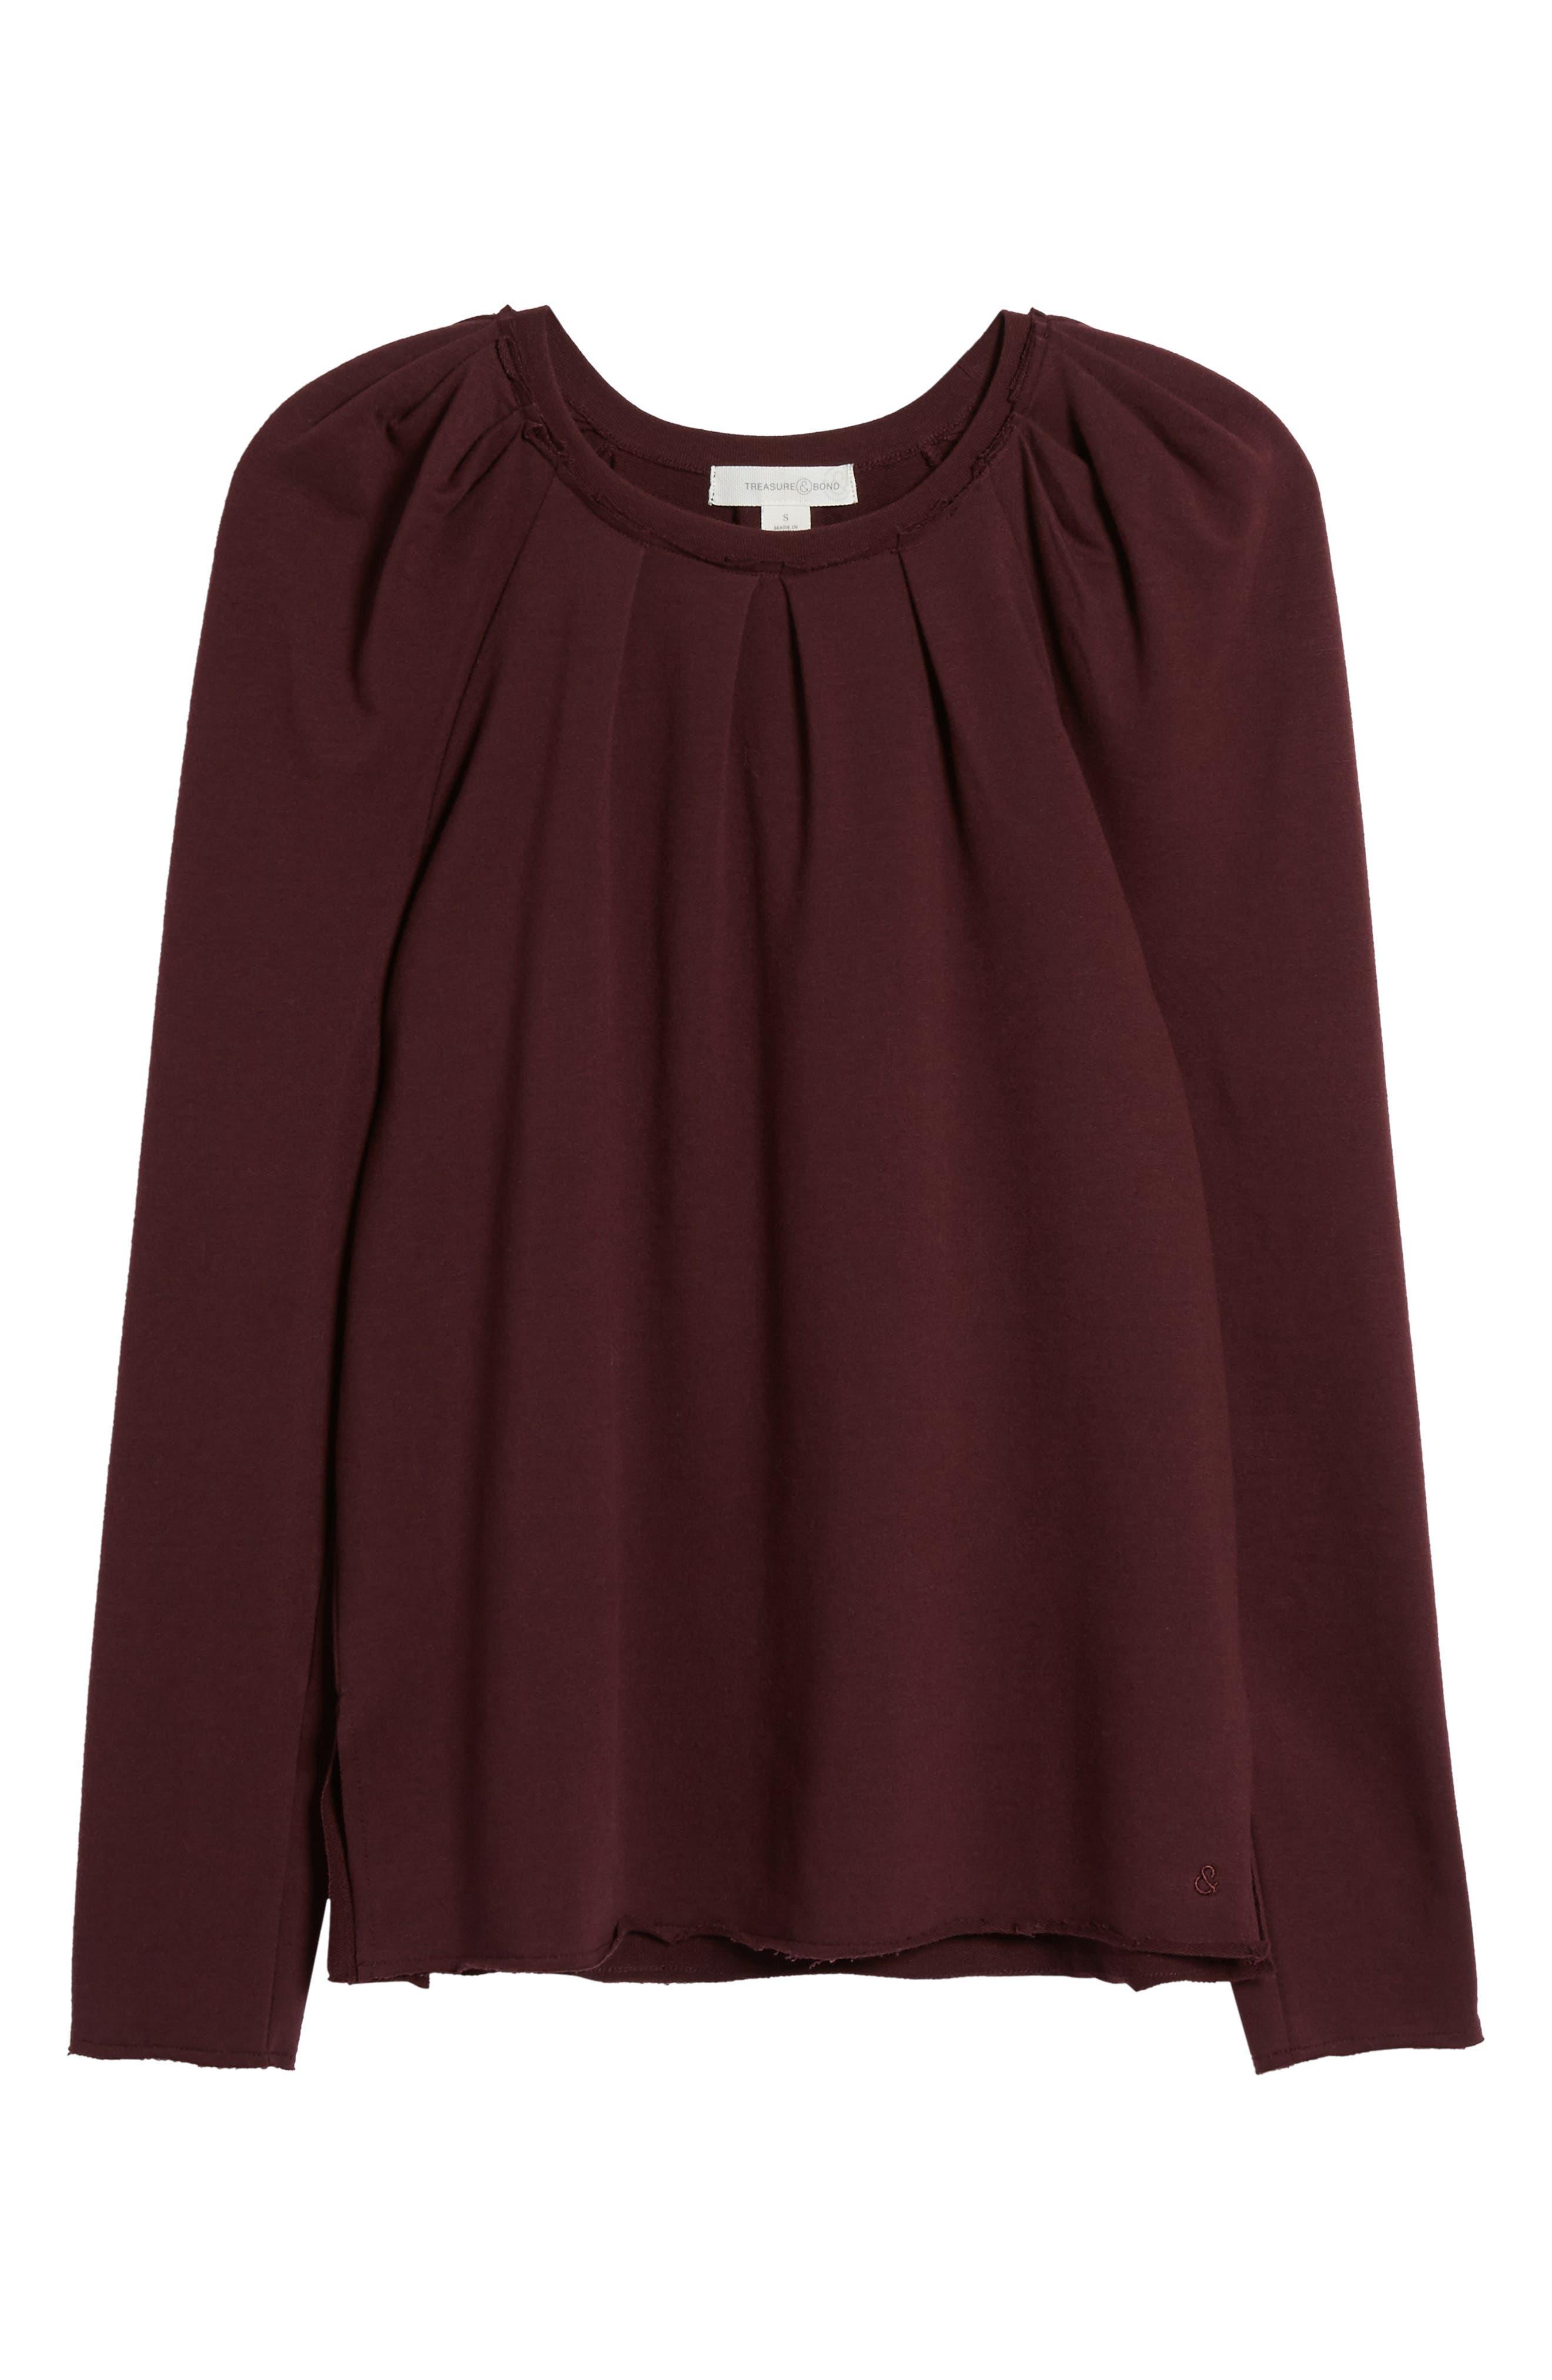 Pleated Knit Top,                             Alternate thumbnail 6, color,                             Burgundy Stem